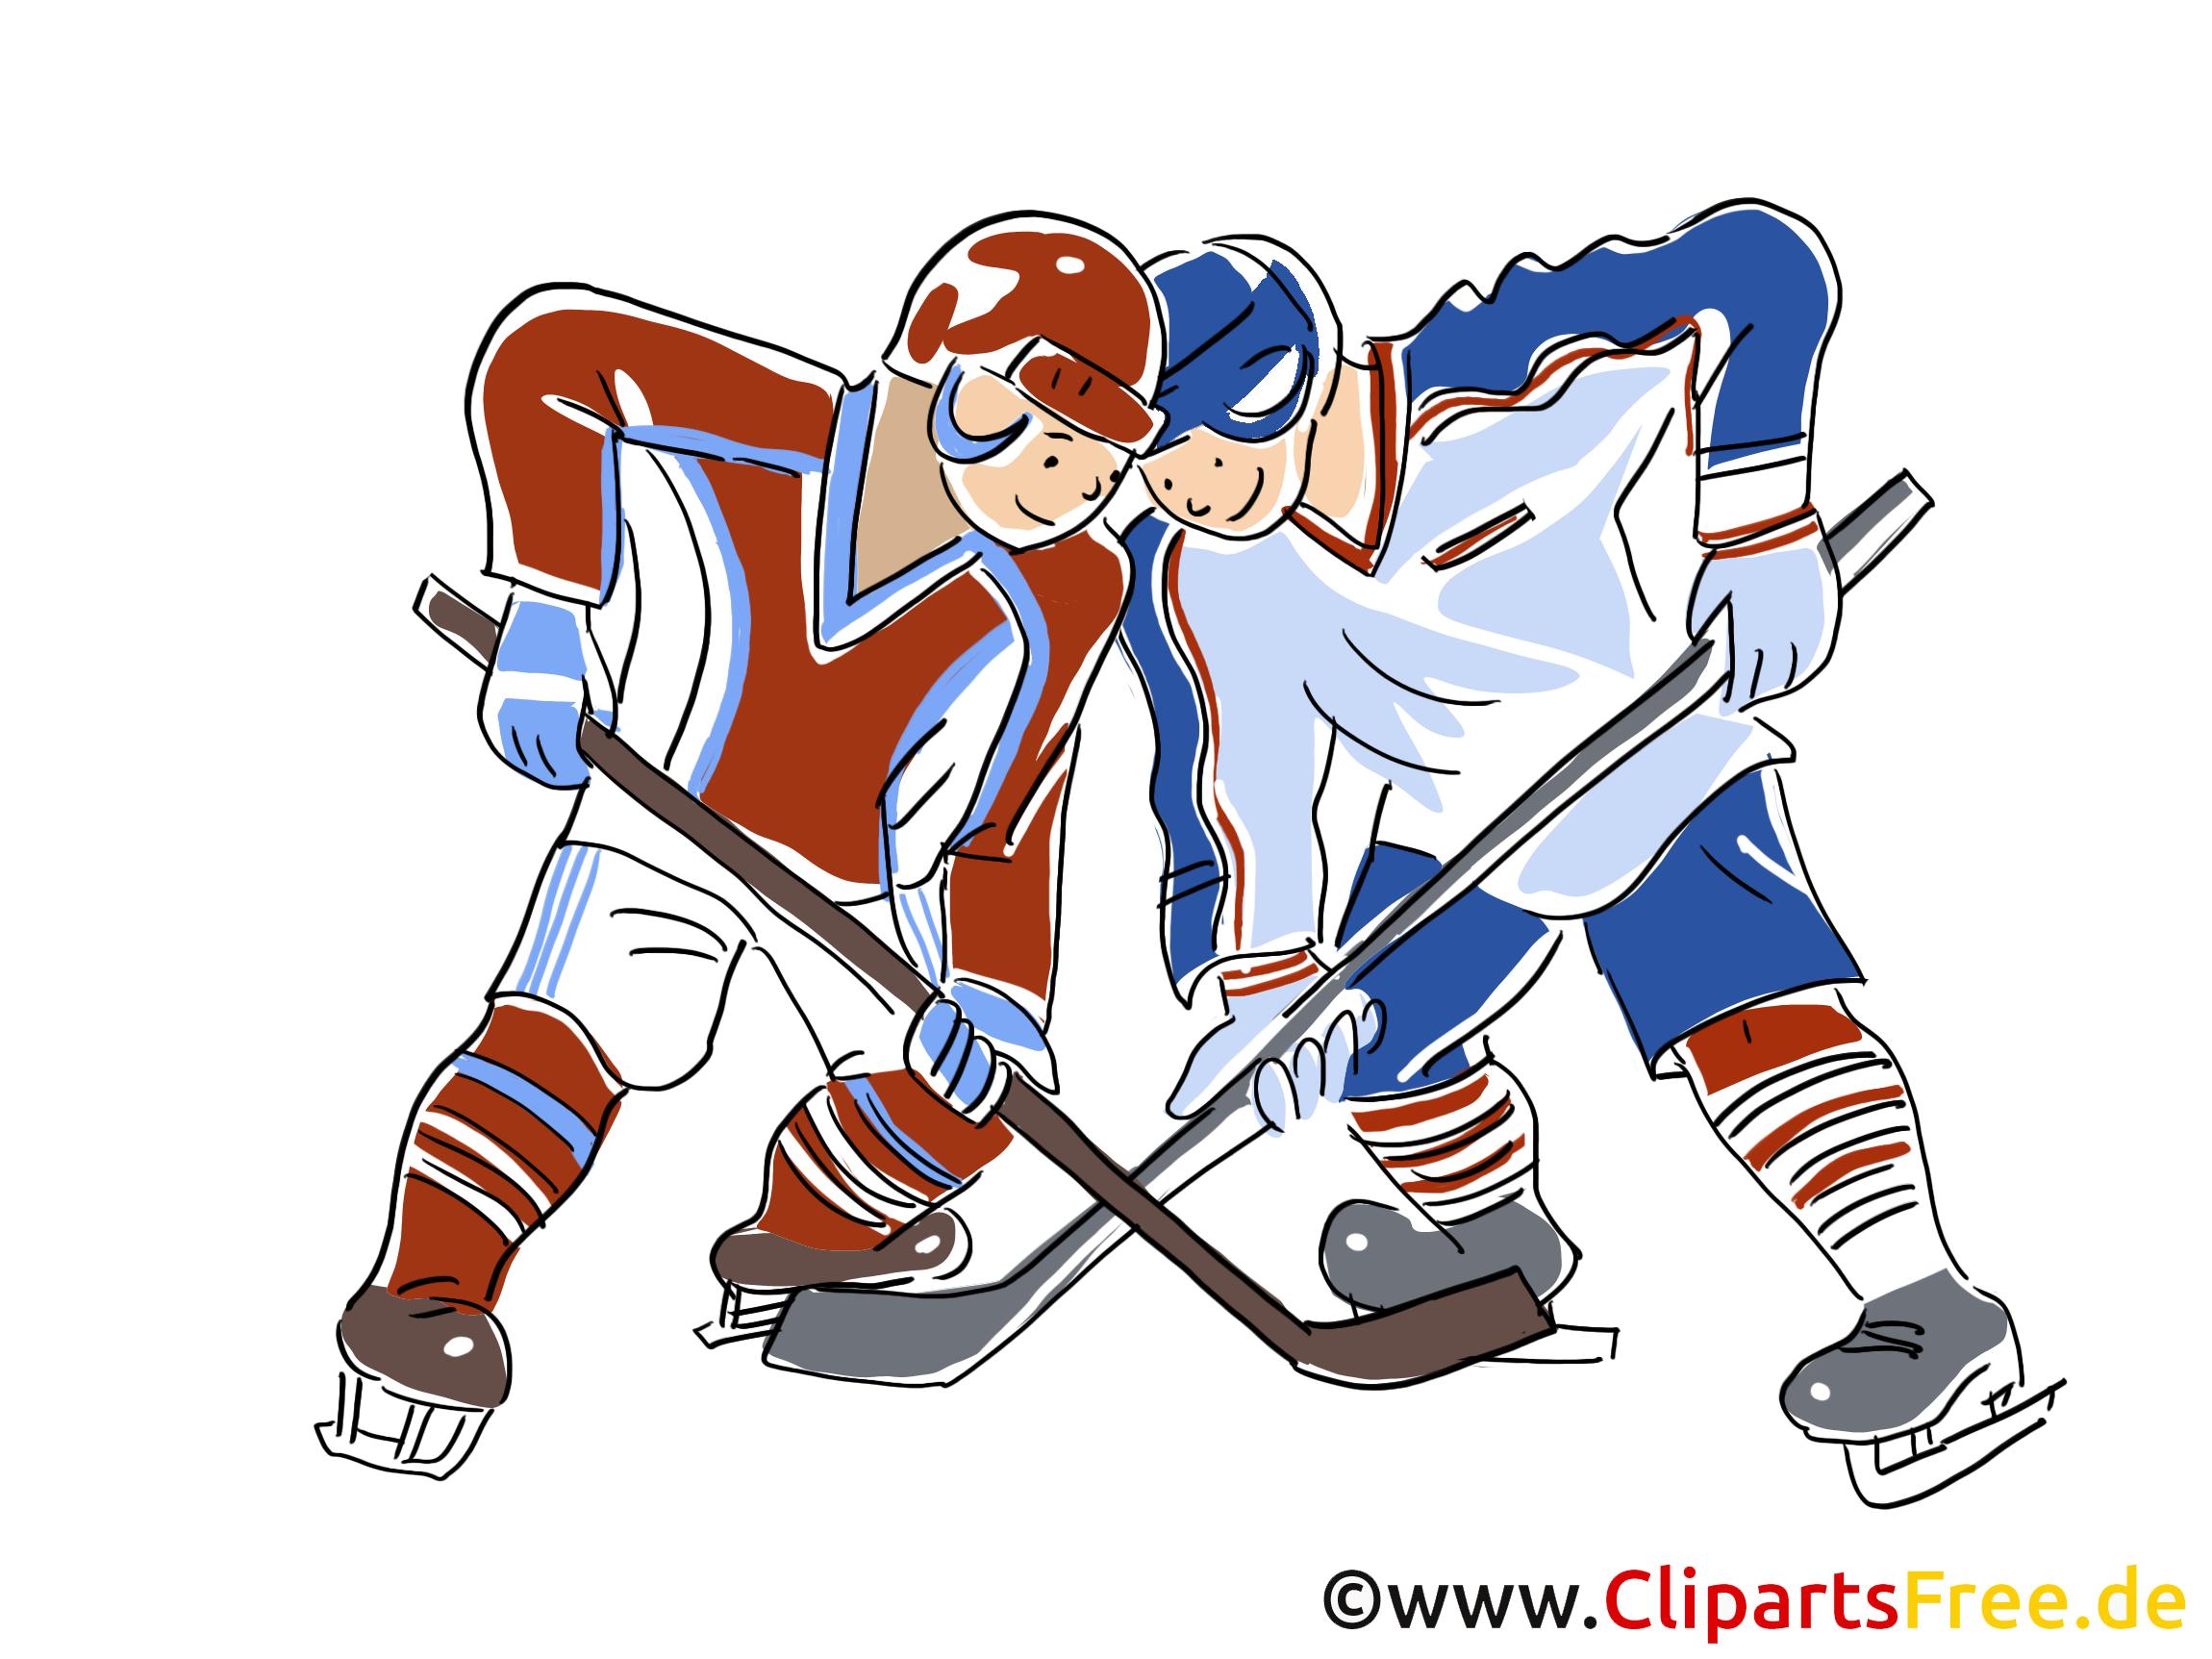 Eishockey WM Clipart, Bild, Comic, Cartoon, Illustration kostenlos